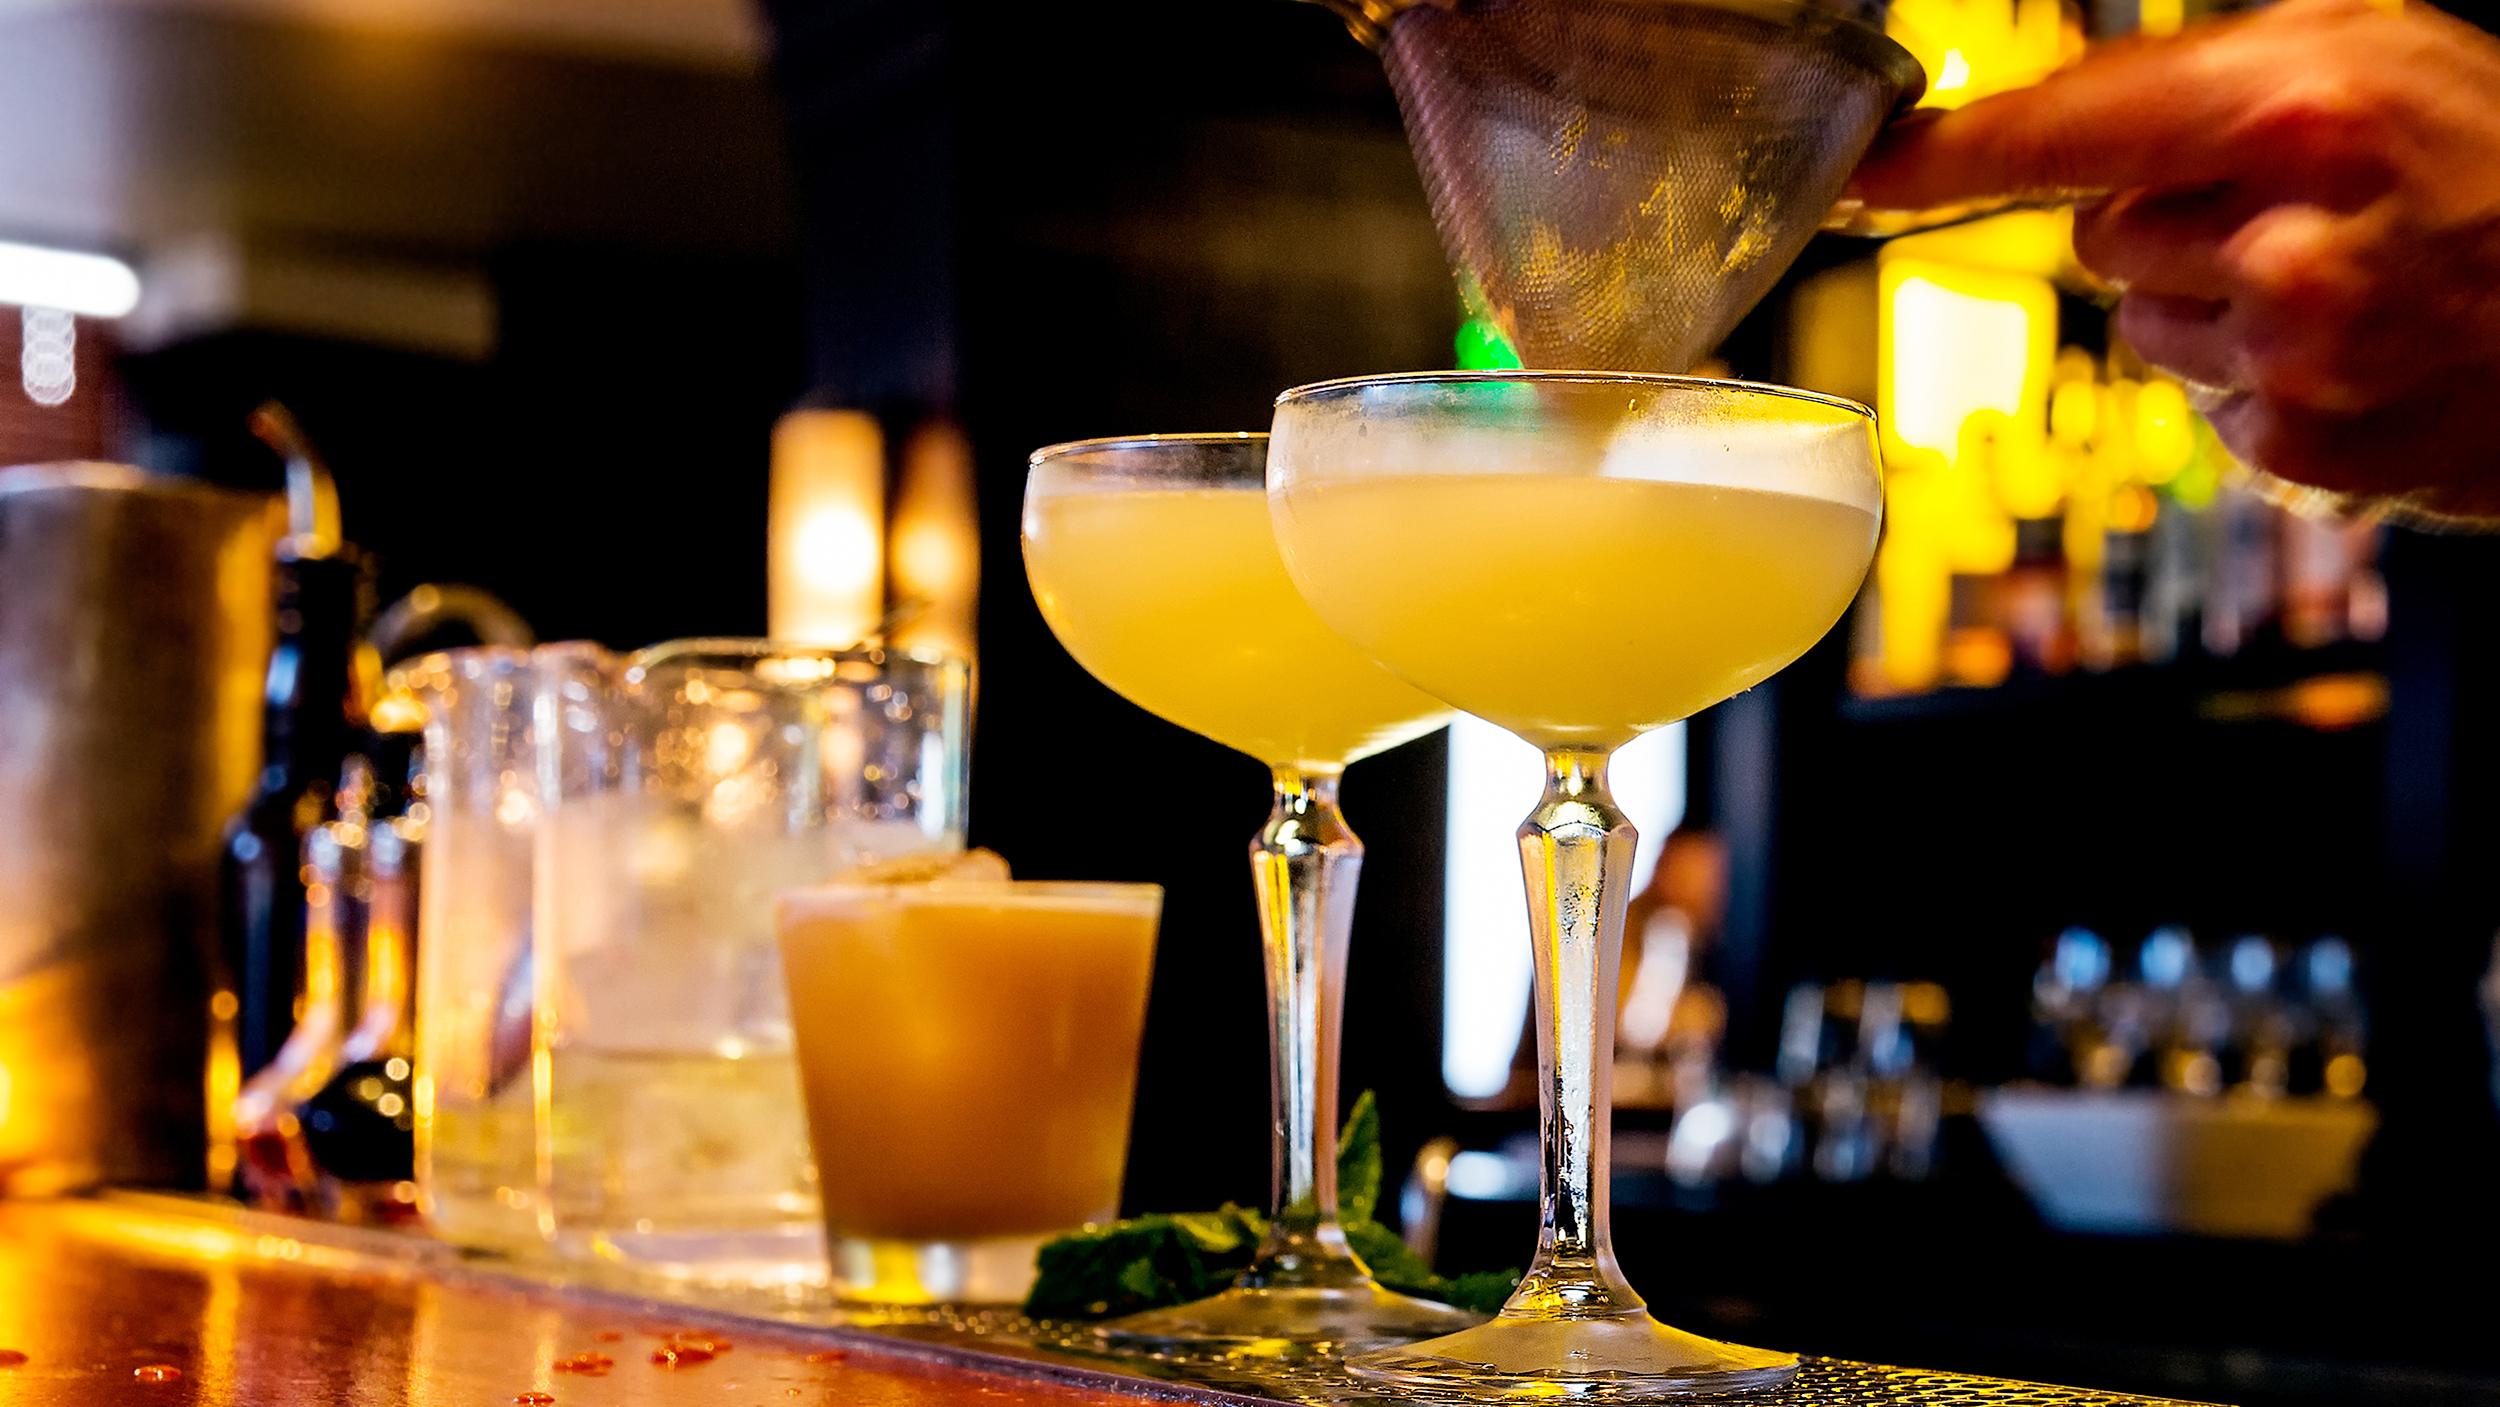 Drinks - TODAY.com